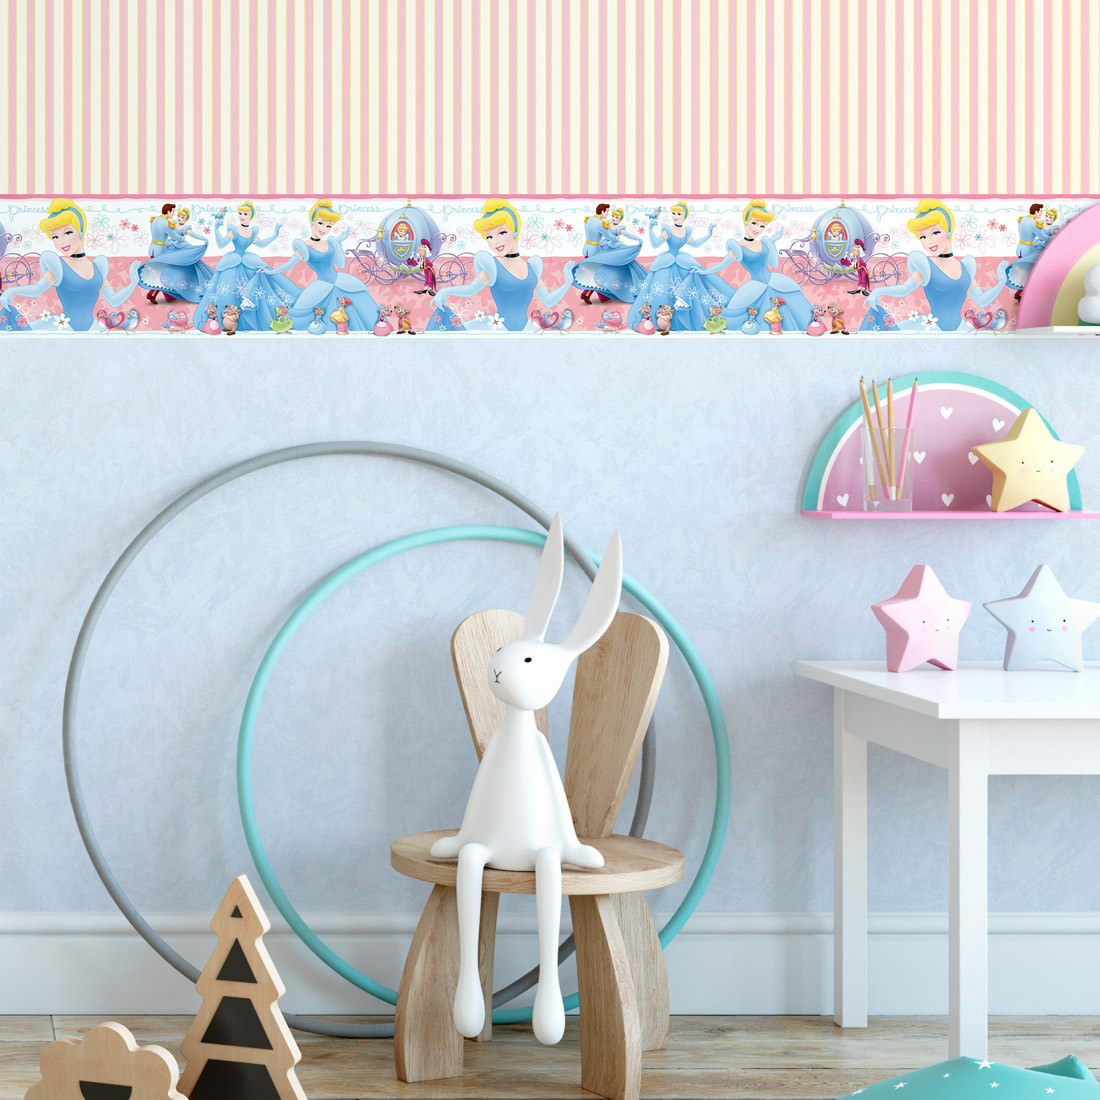 Faixa Decorativa Infantil Cinderela - Disney